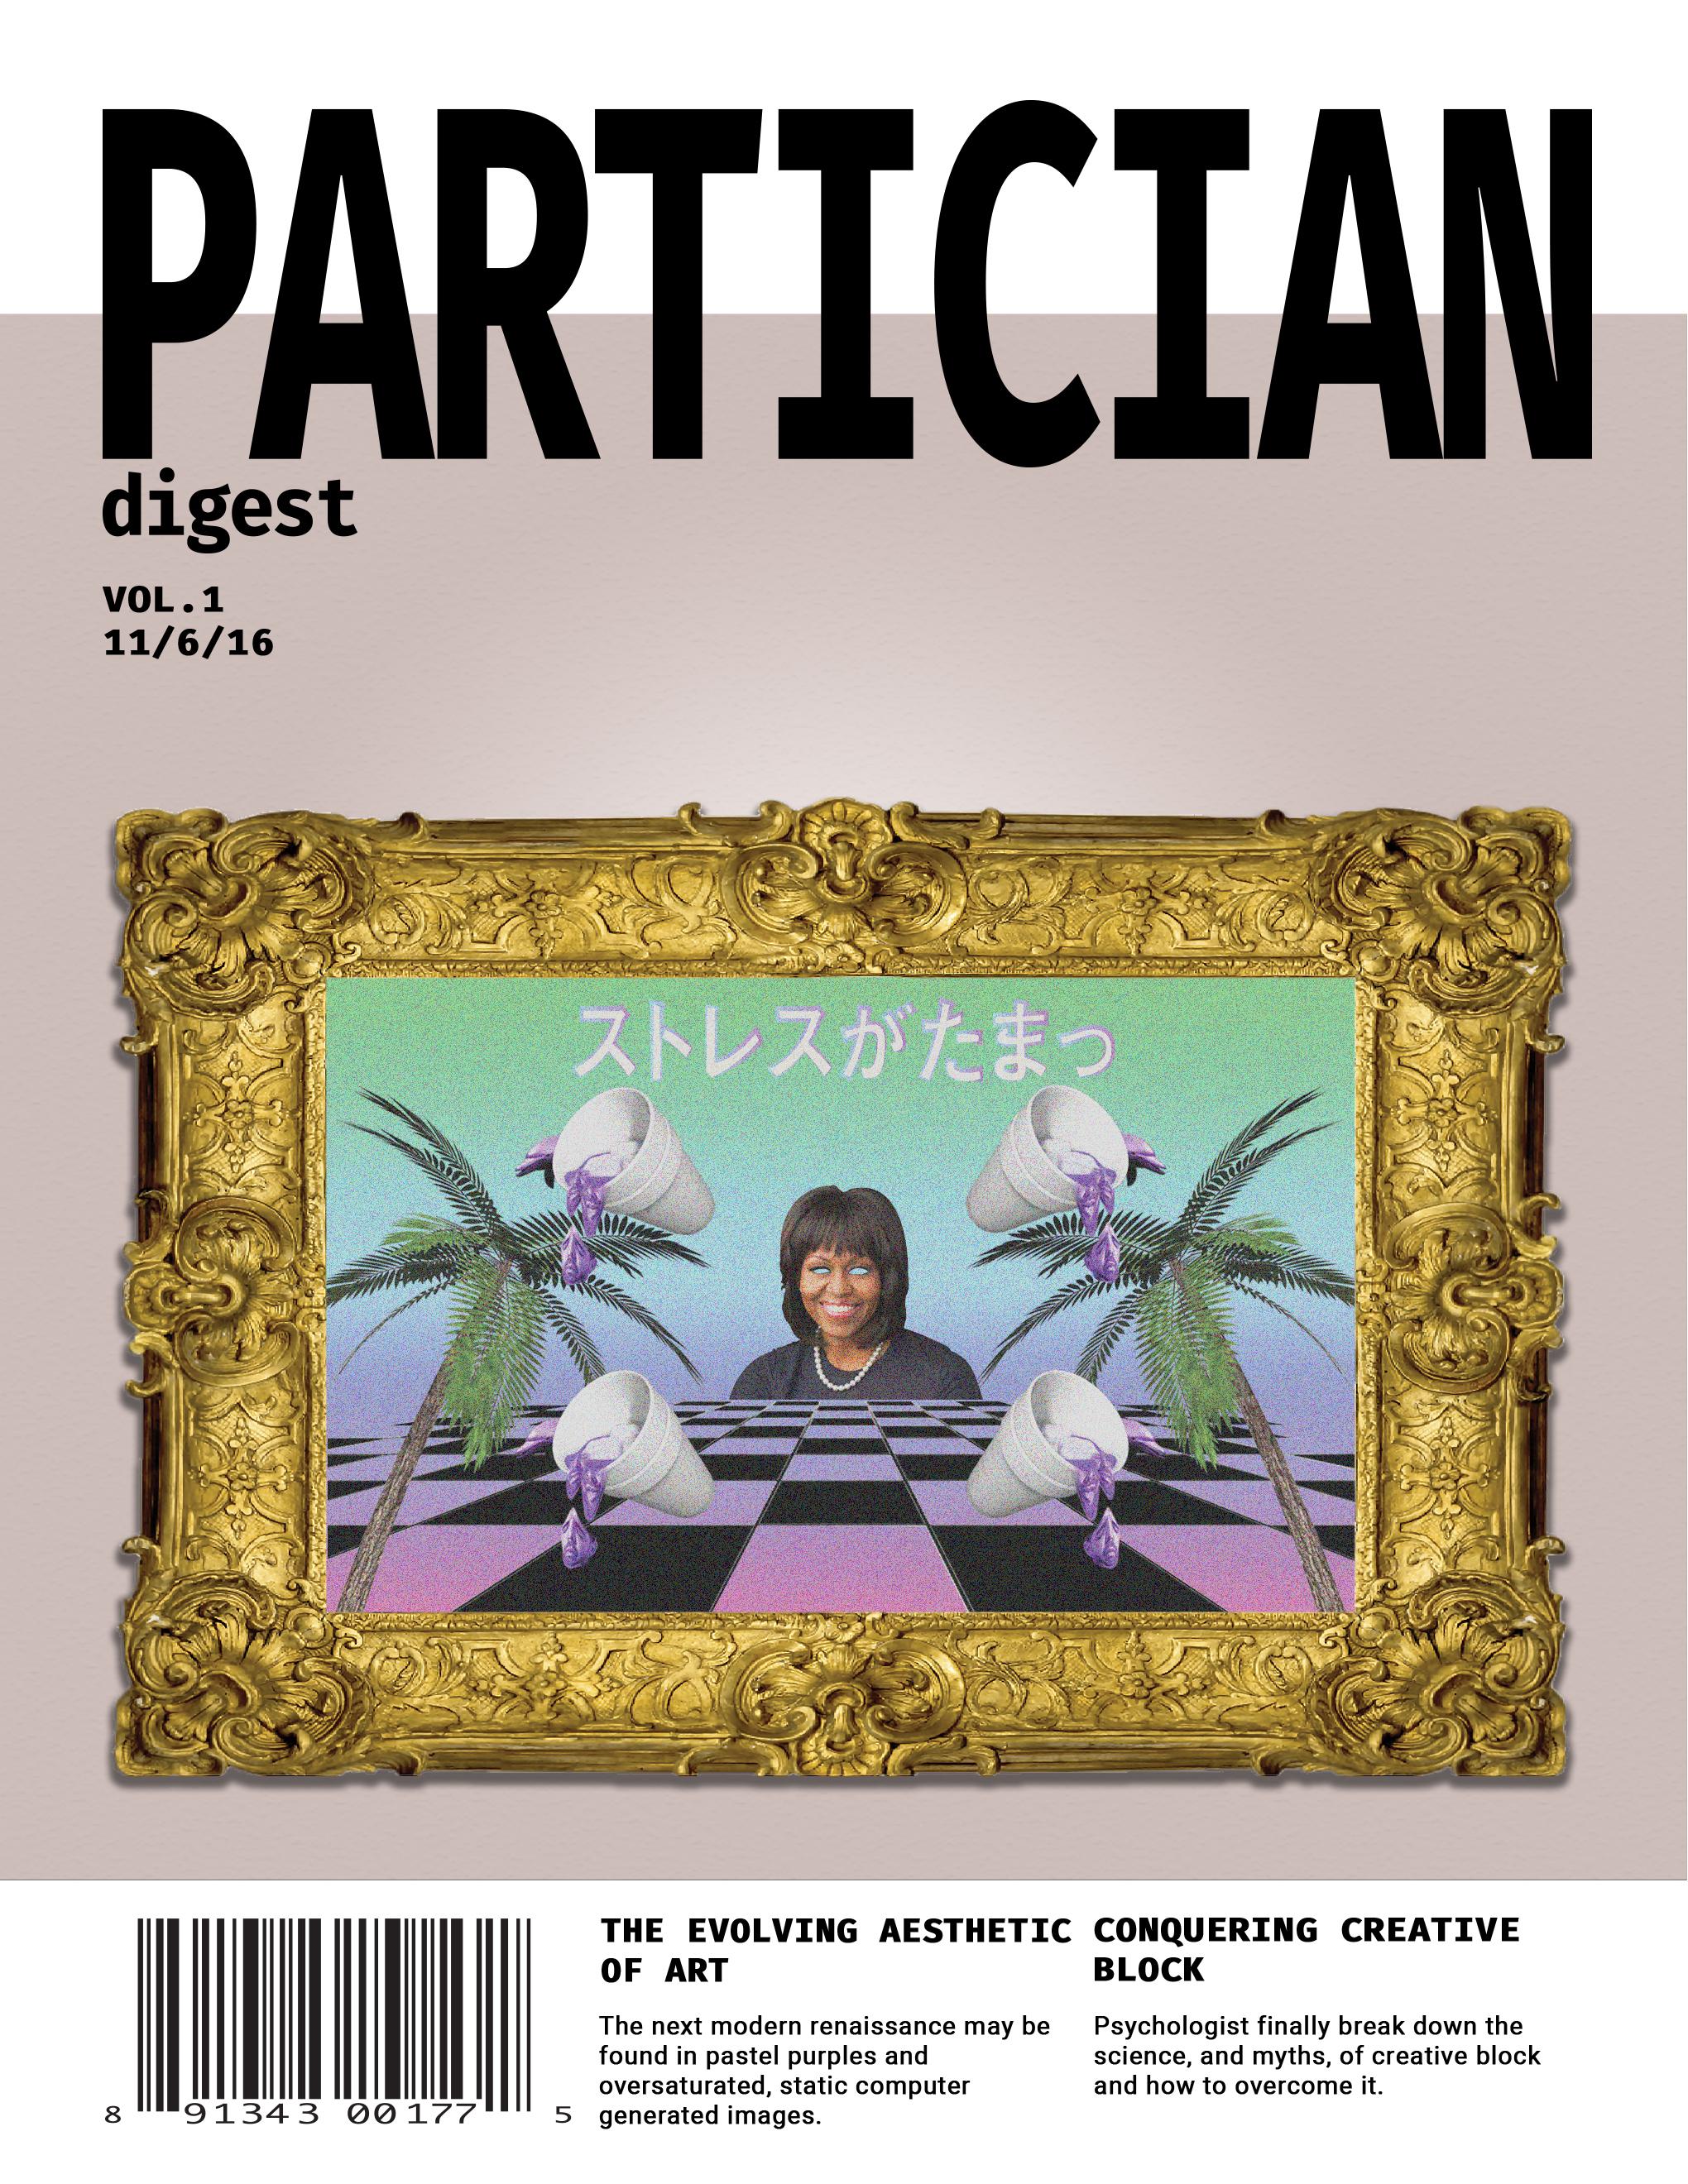 Brandon Tse Partician Digest Magazine Cover